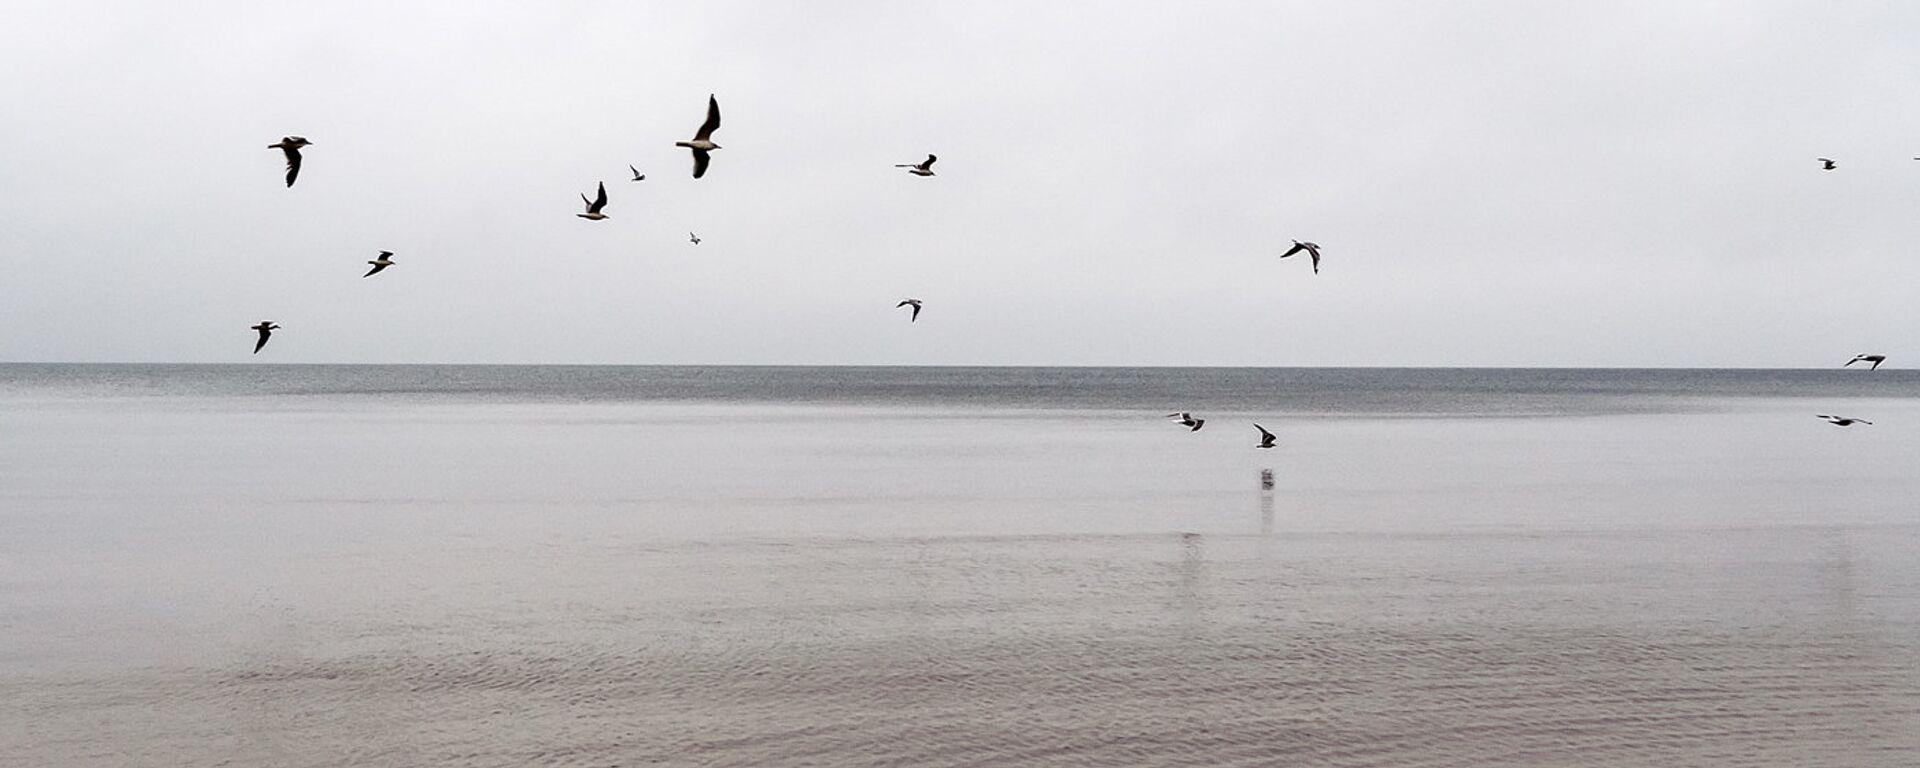 Пляж Юрмалы - Sputnik Латвия, 1920, 15.07.2021